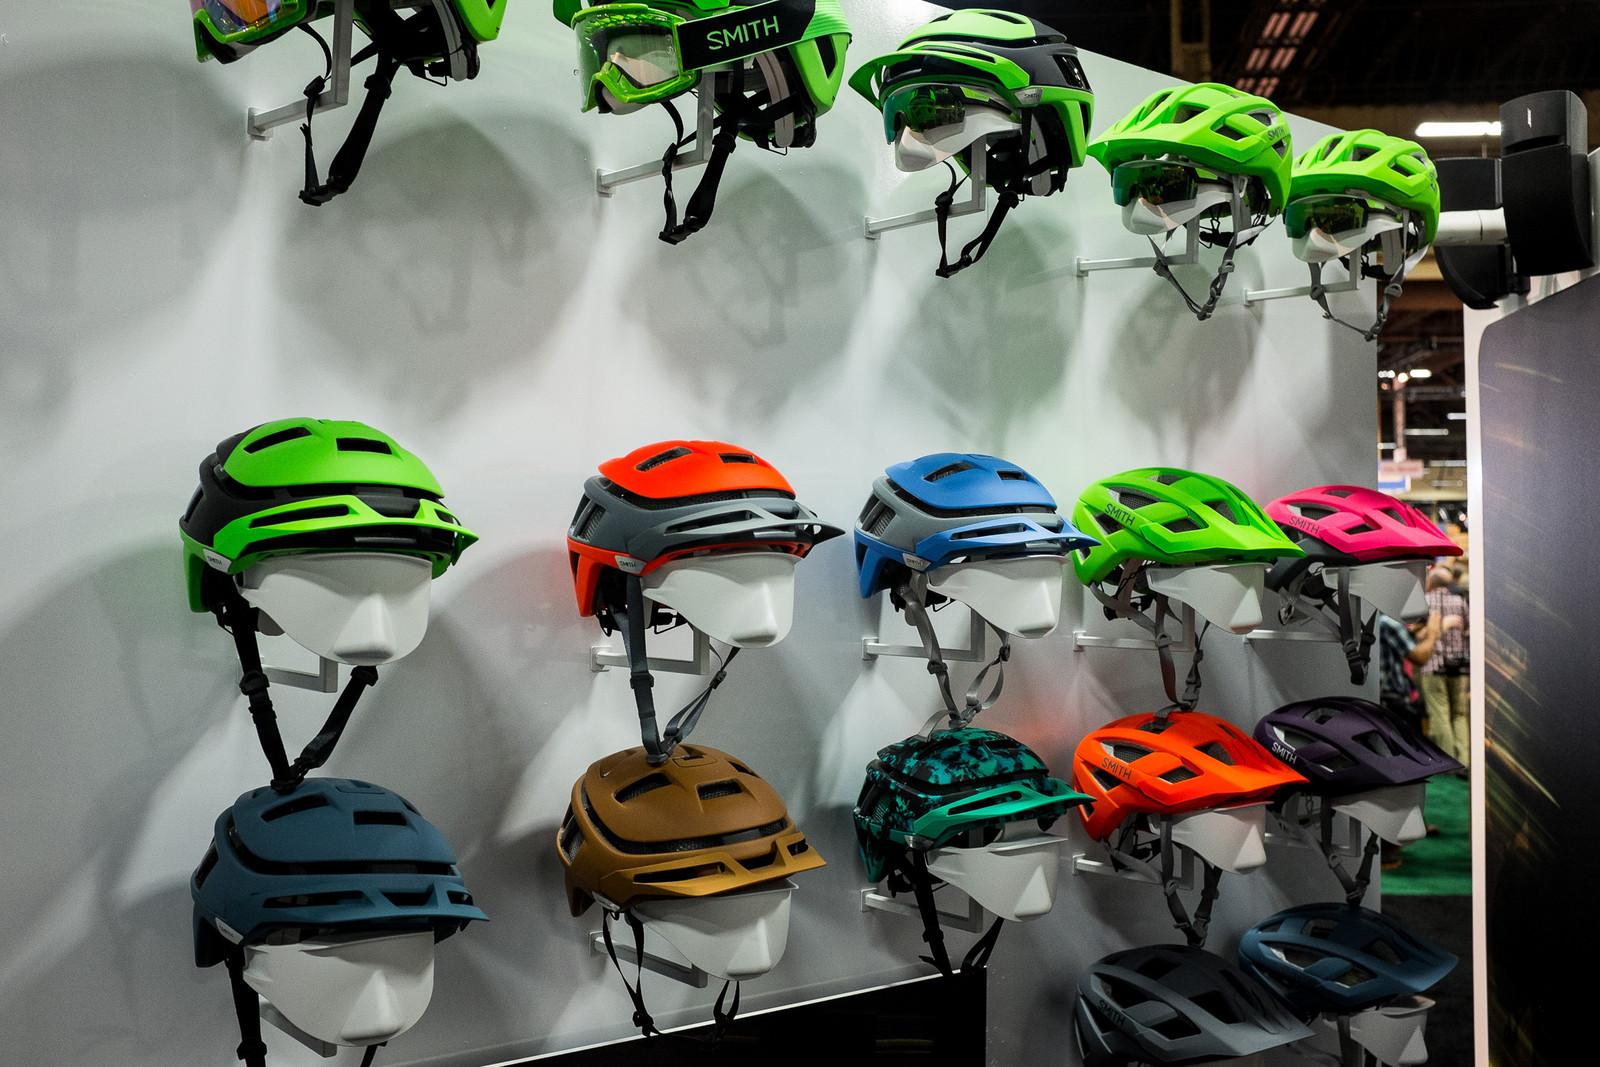 2017 Smith Helmets - INTERBIKE - 2017 Mountain Bike Apparel and Protective Gear - Mountain Biking Pictures - Vital MTB